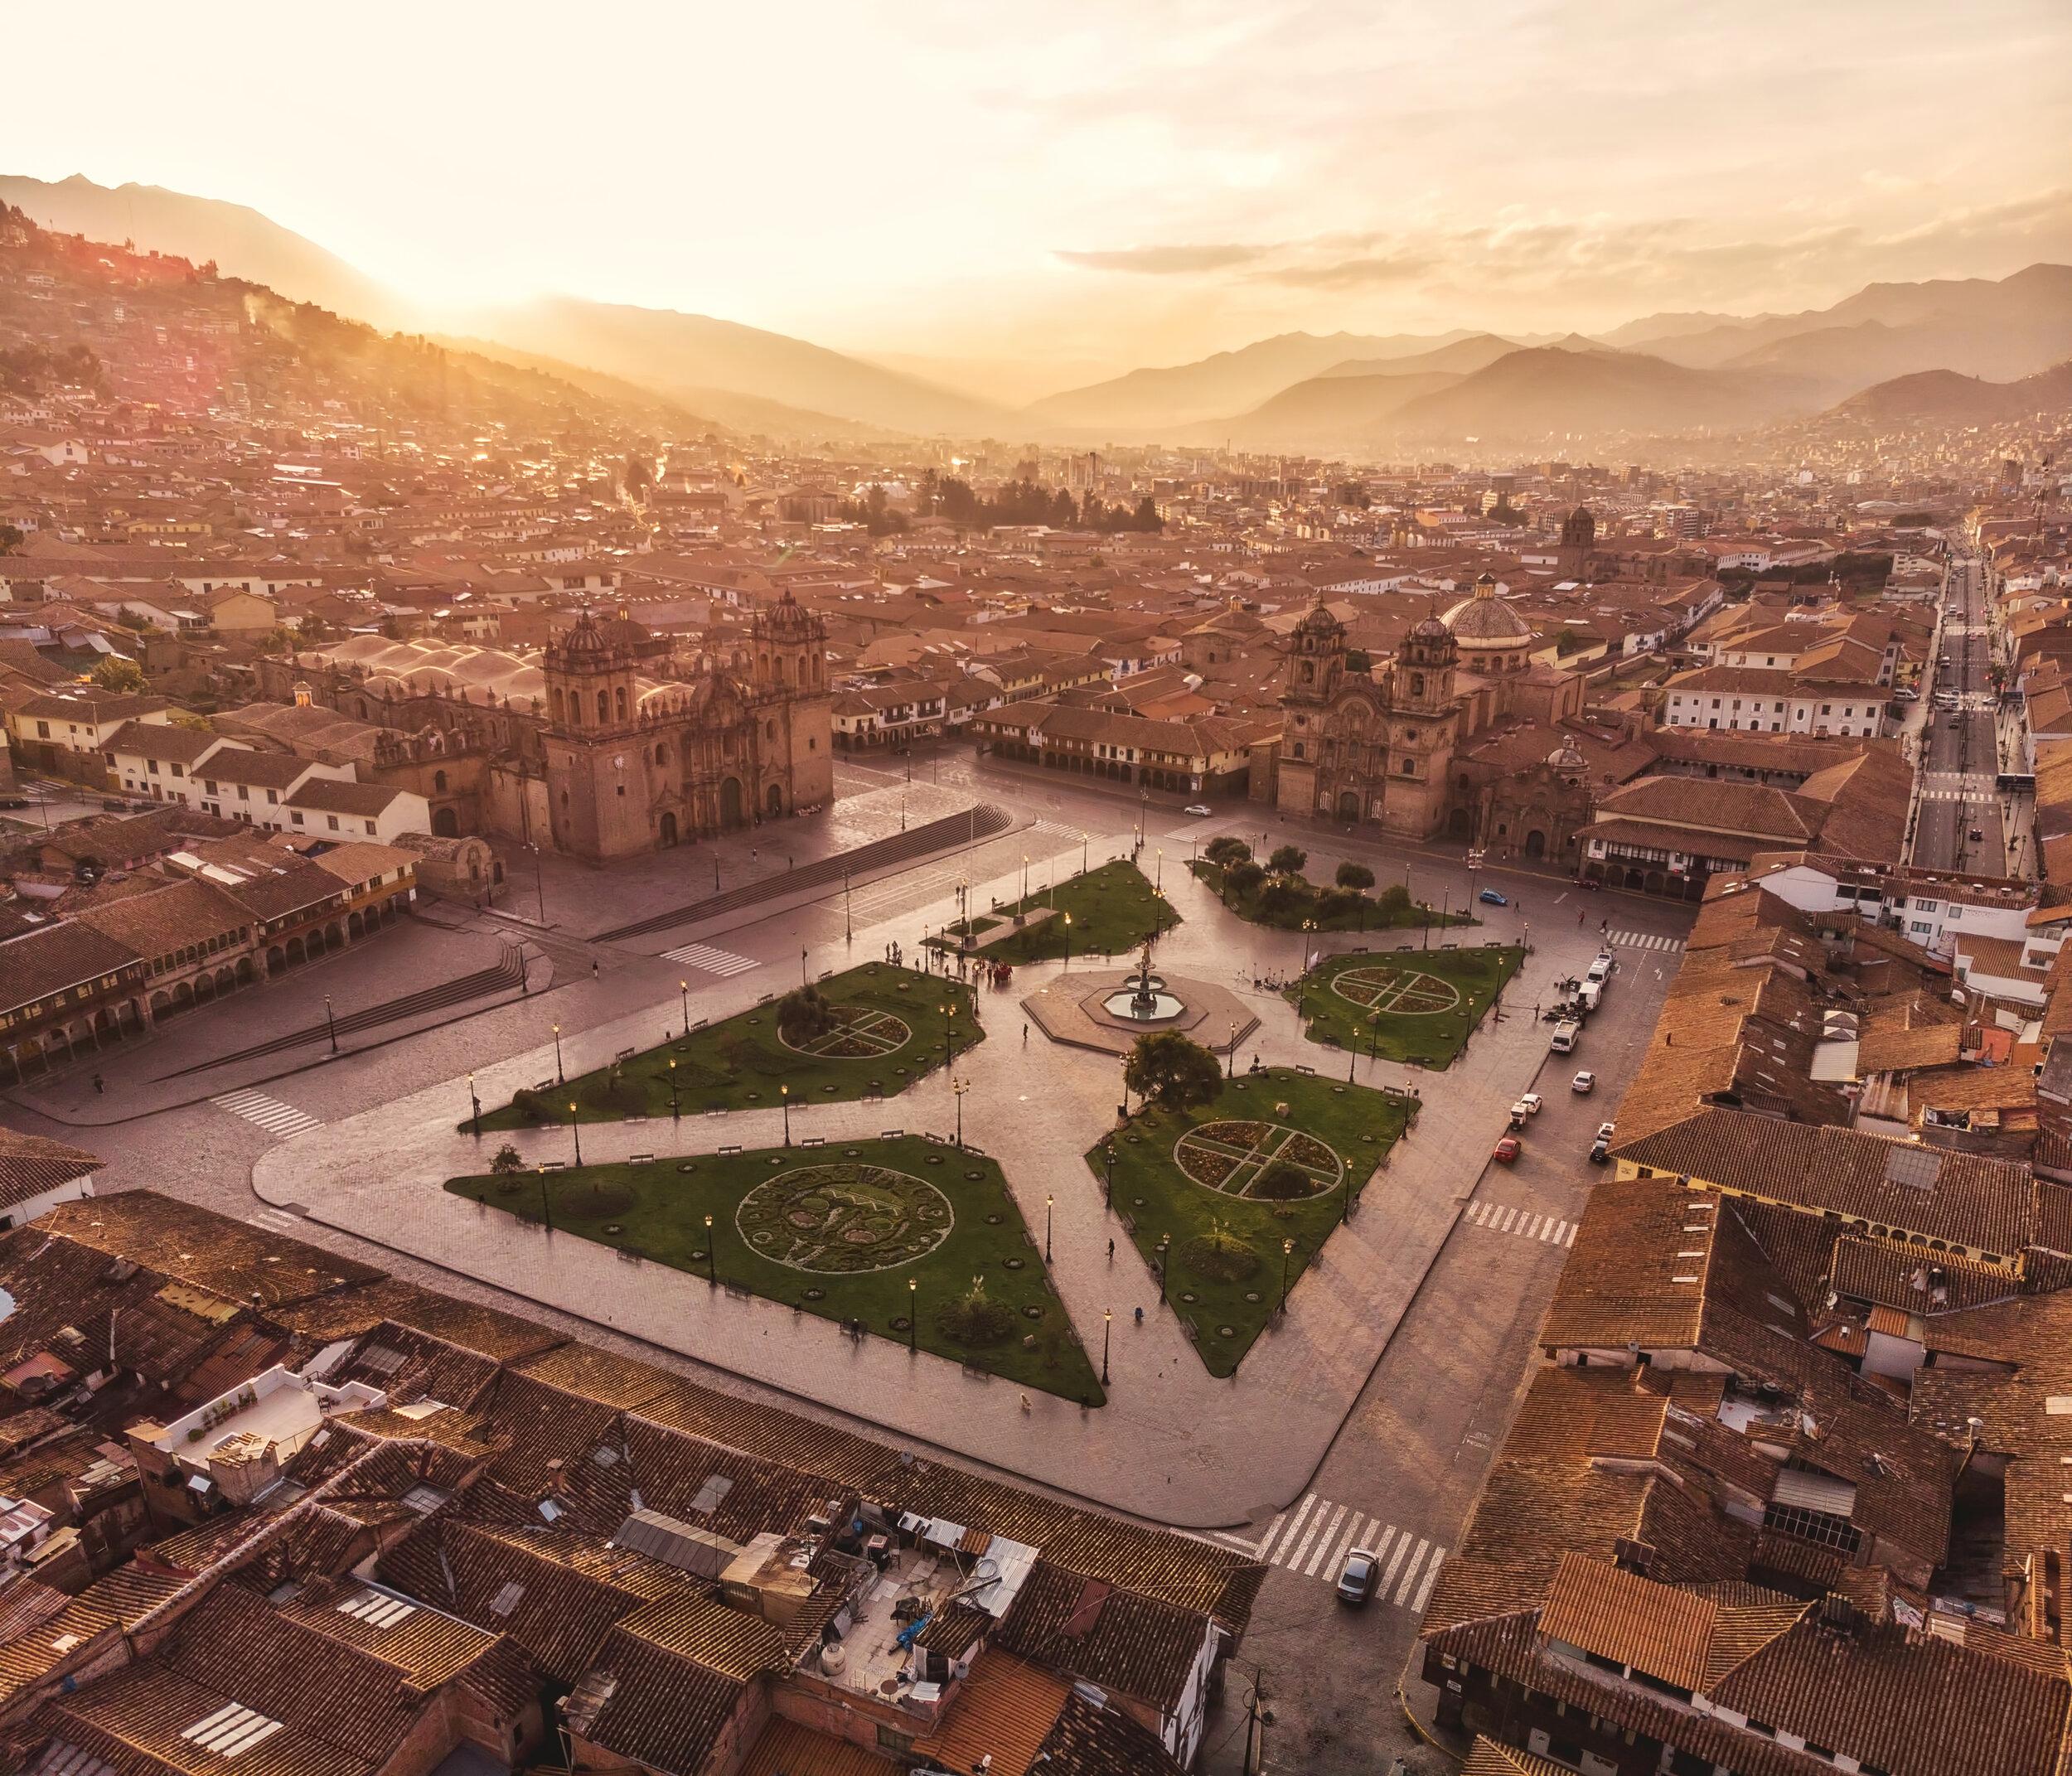 Cuscosunrise.JPEG